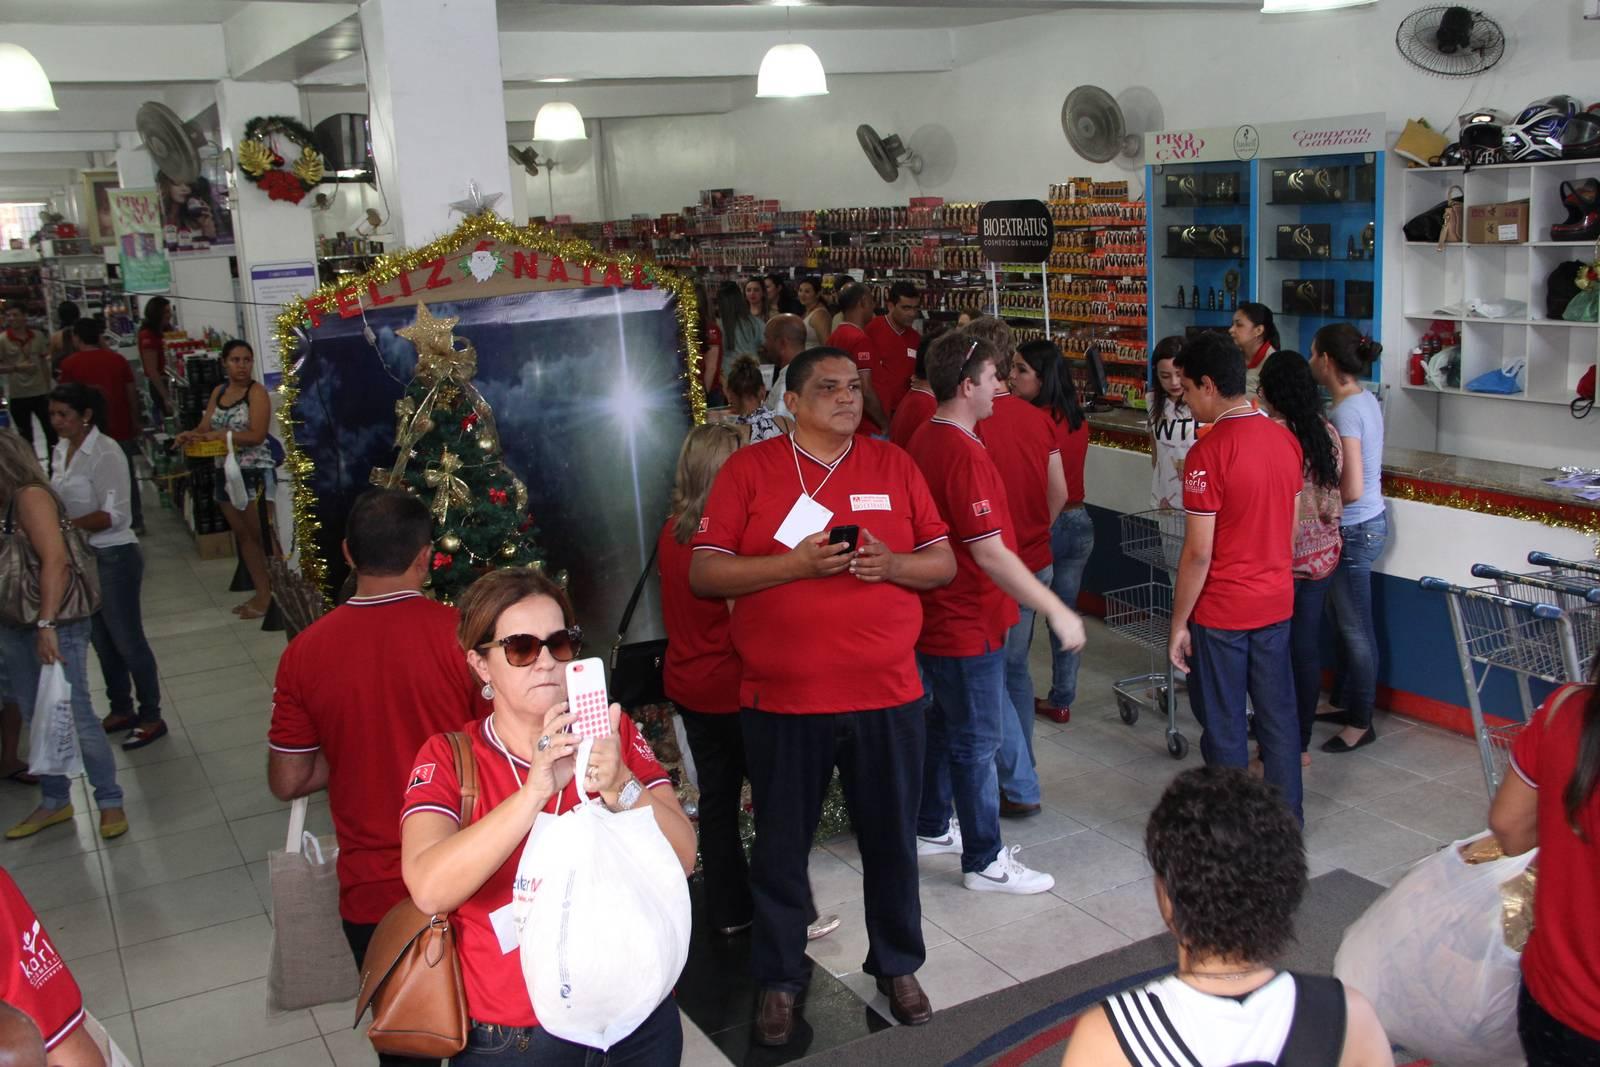 IV Encontro Regional do Nordeste - Bio Extratus (182)